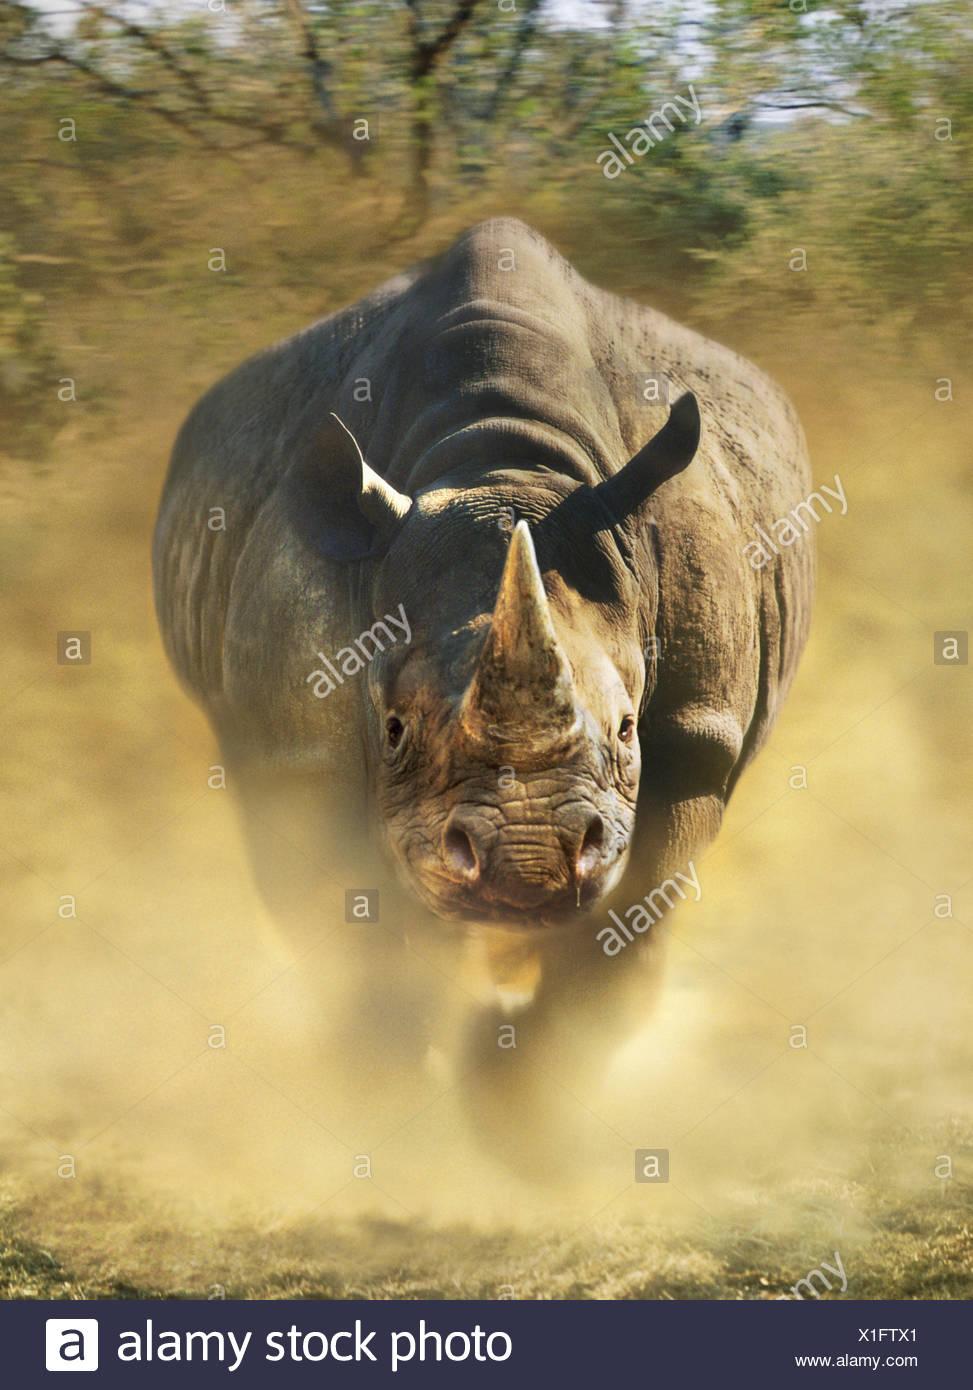 Charging black rhinoceros - Stock Image